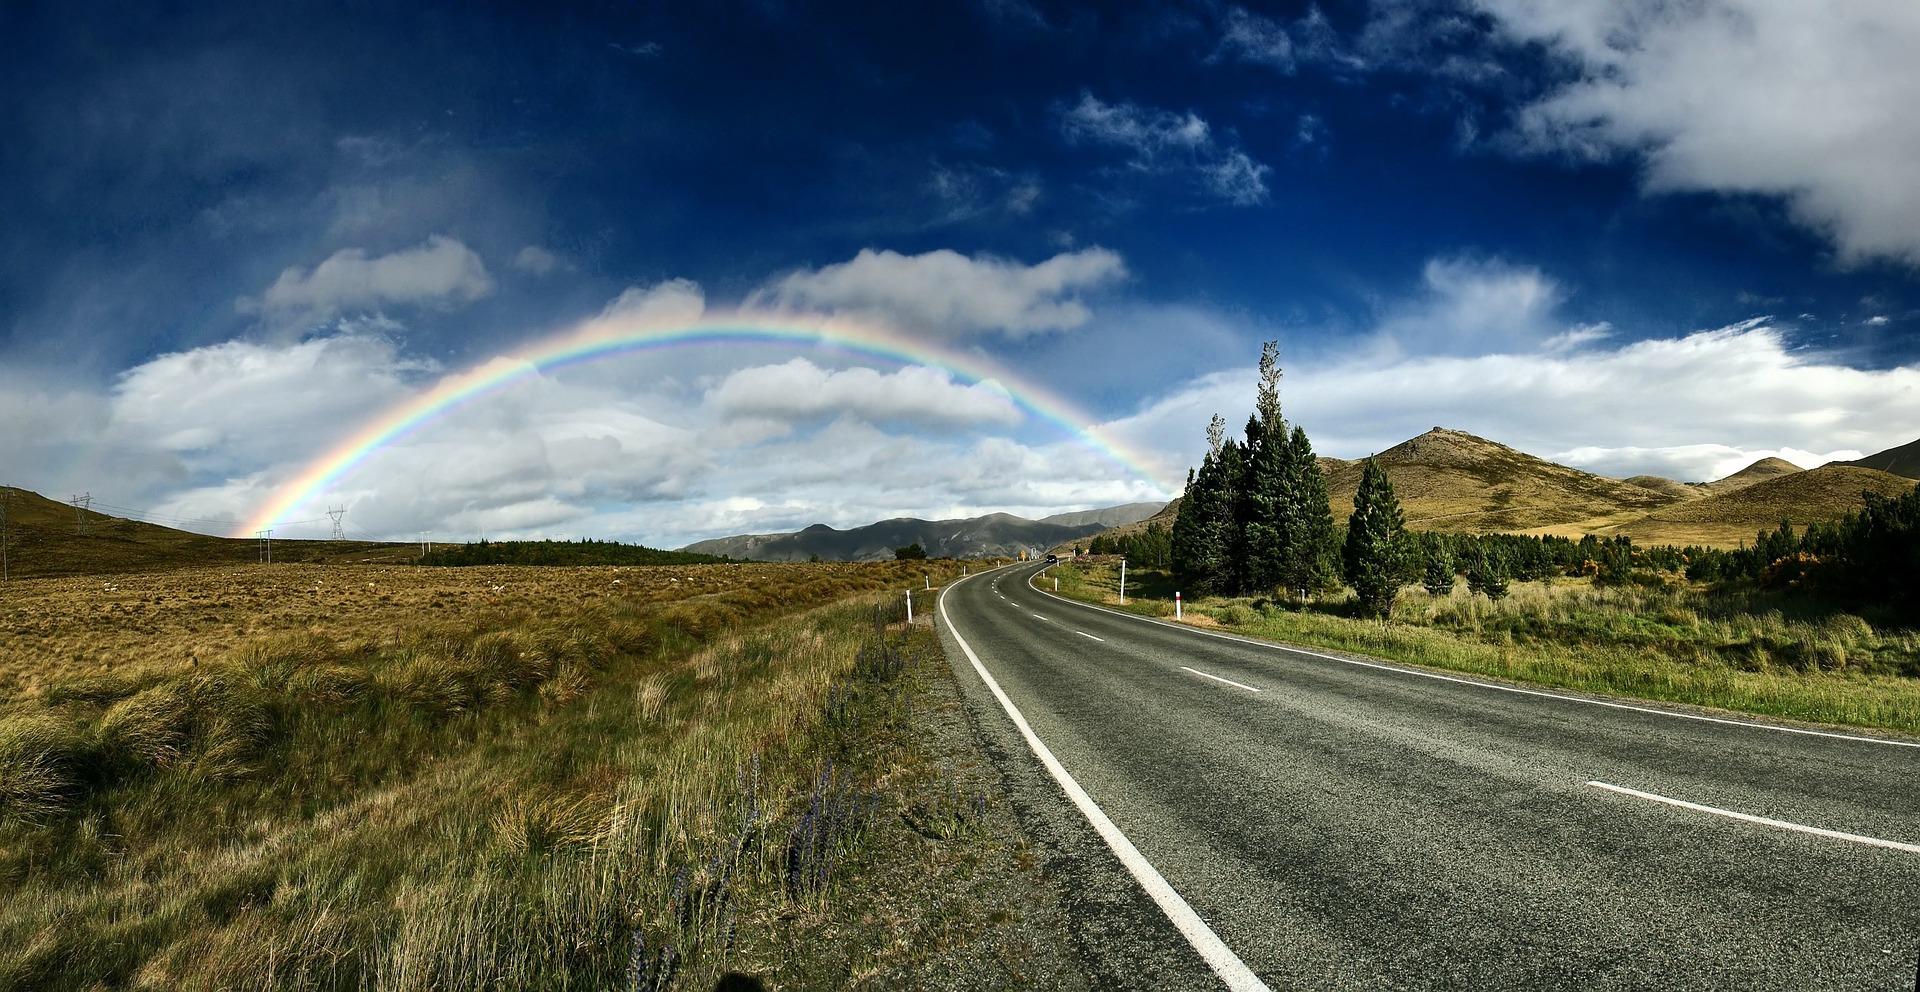 rainbow-1149610_1920.jpg